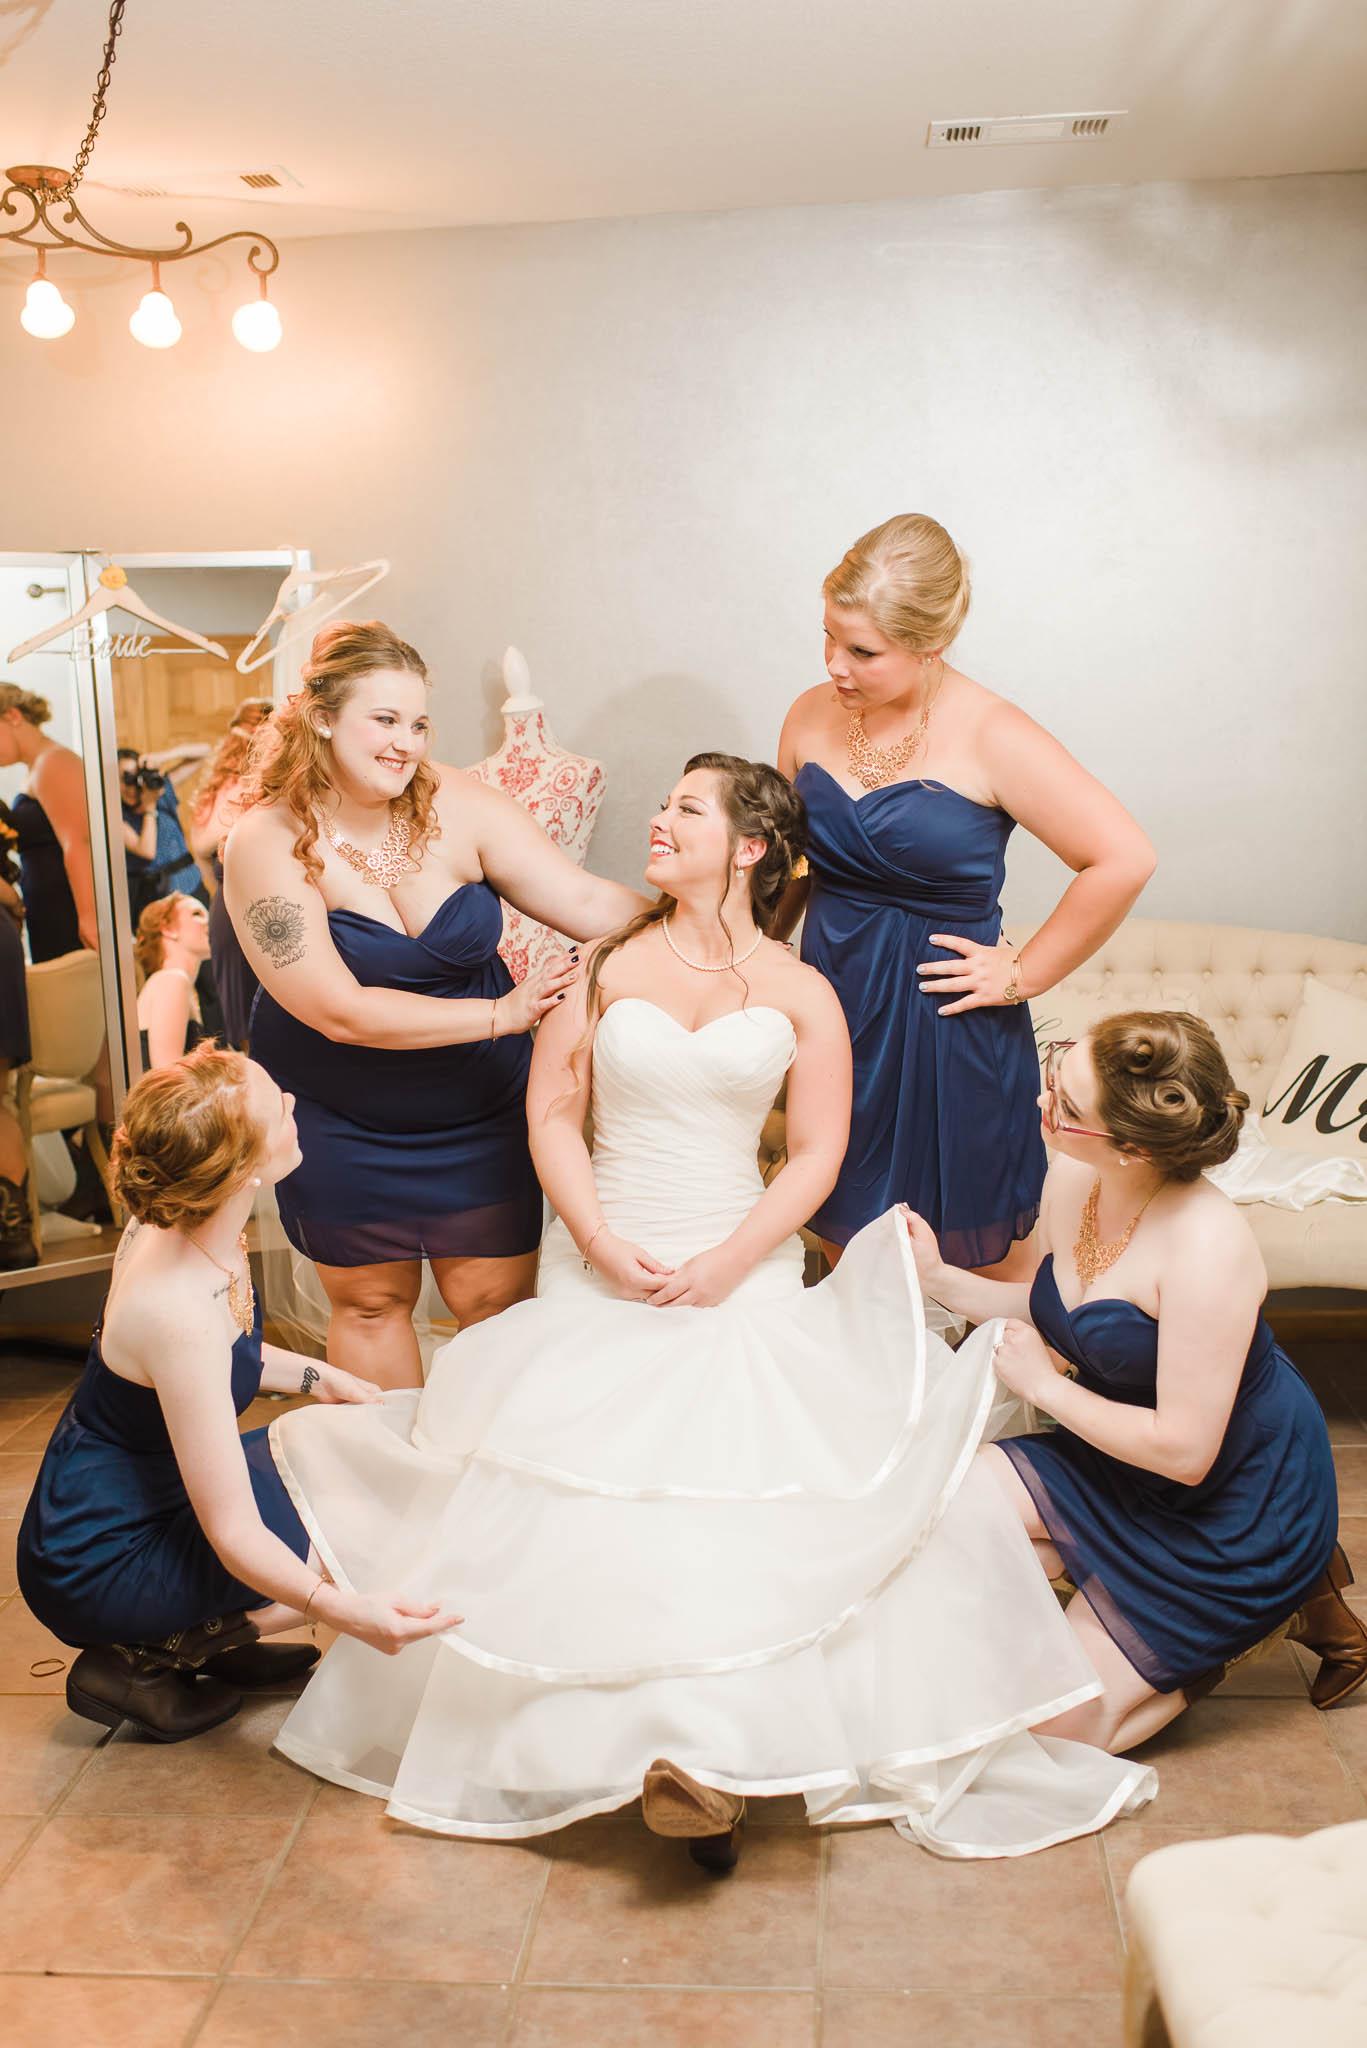 bridesmaids adjusting bride's dress on wedding day